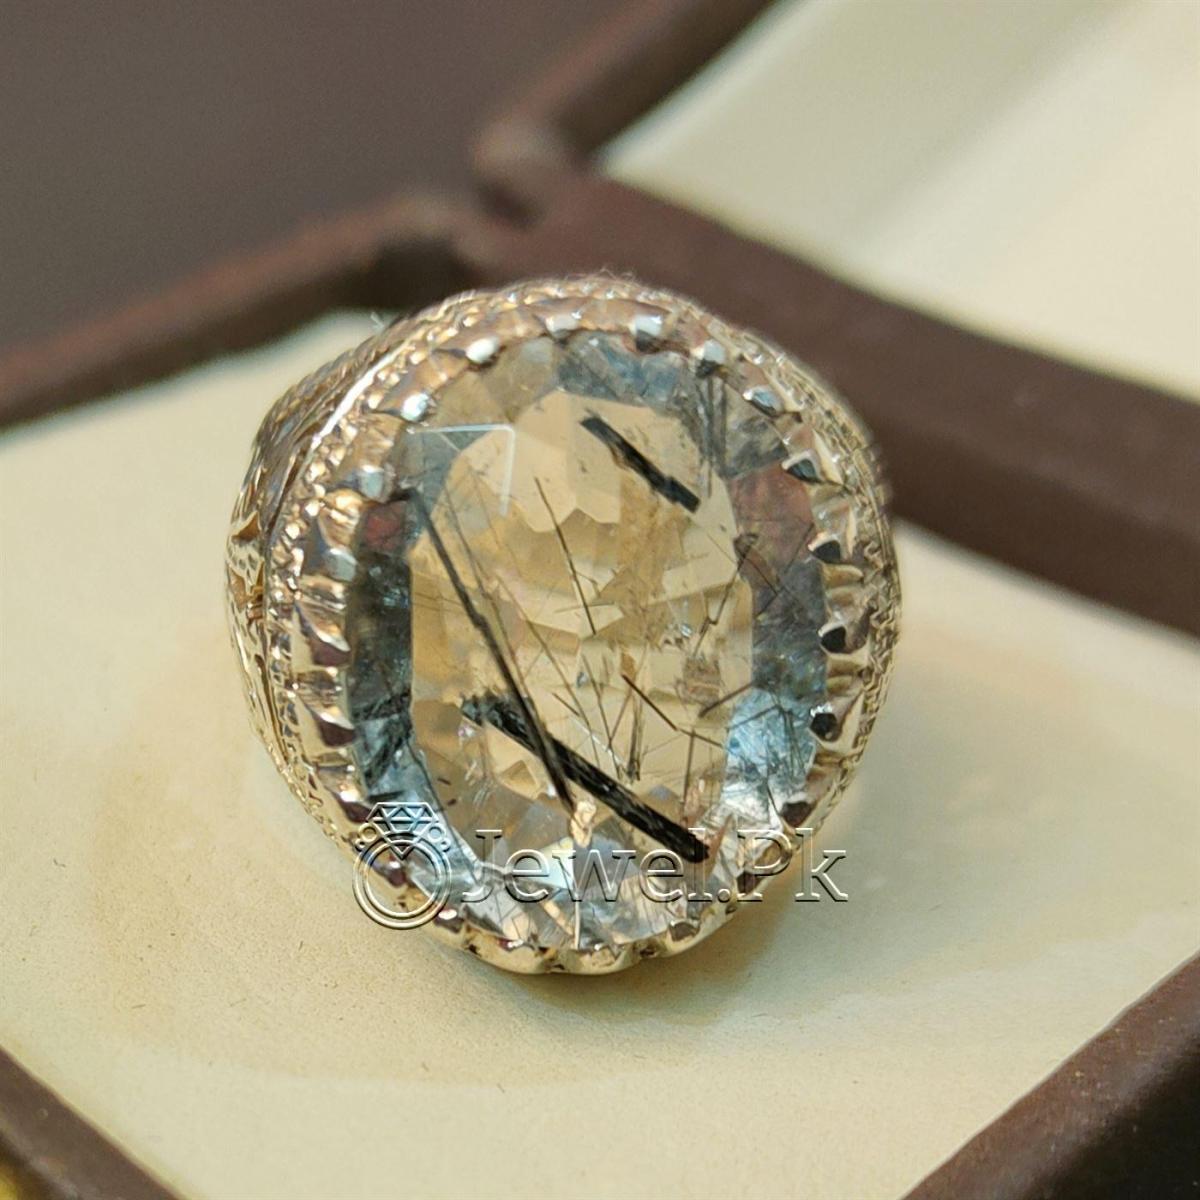 Natural Moh e Najaf Gemstone Ring 925 Silver Handmade Chandi ring mohe najaf Rutile Quartz Stone 5 1 natural gemstones pakistan + 925 silver jewelry online